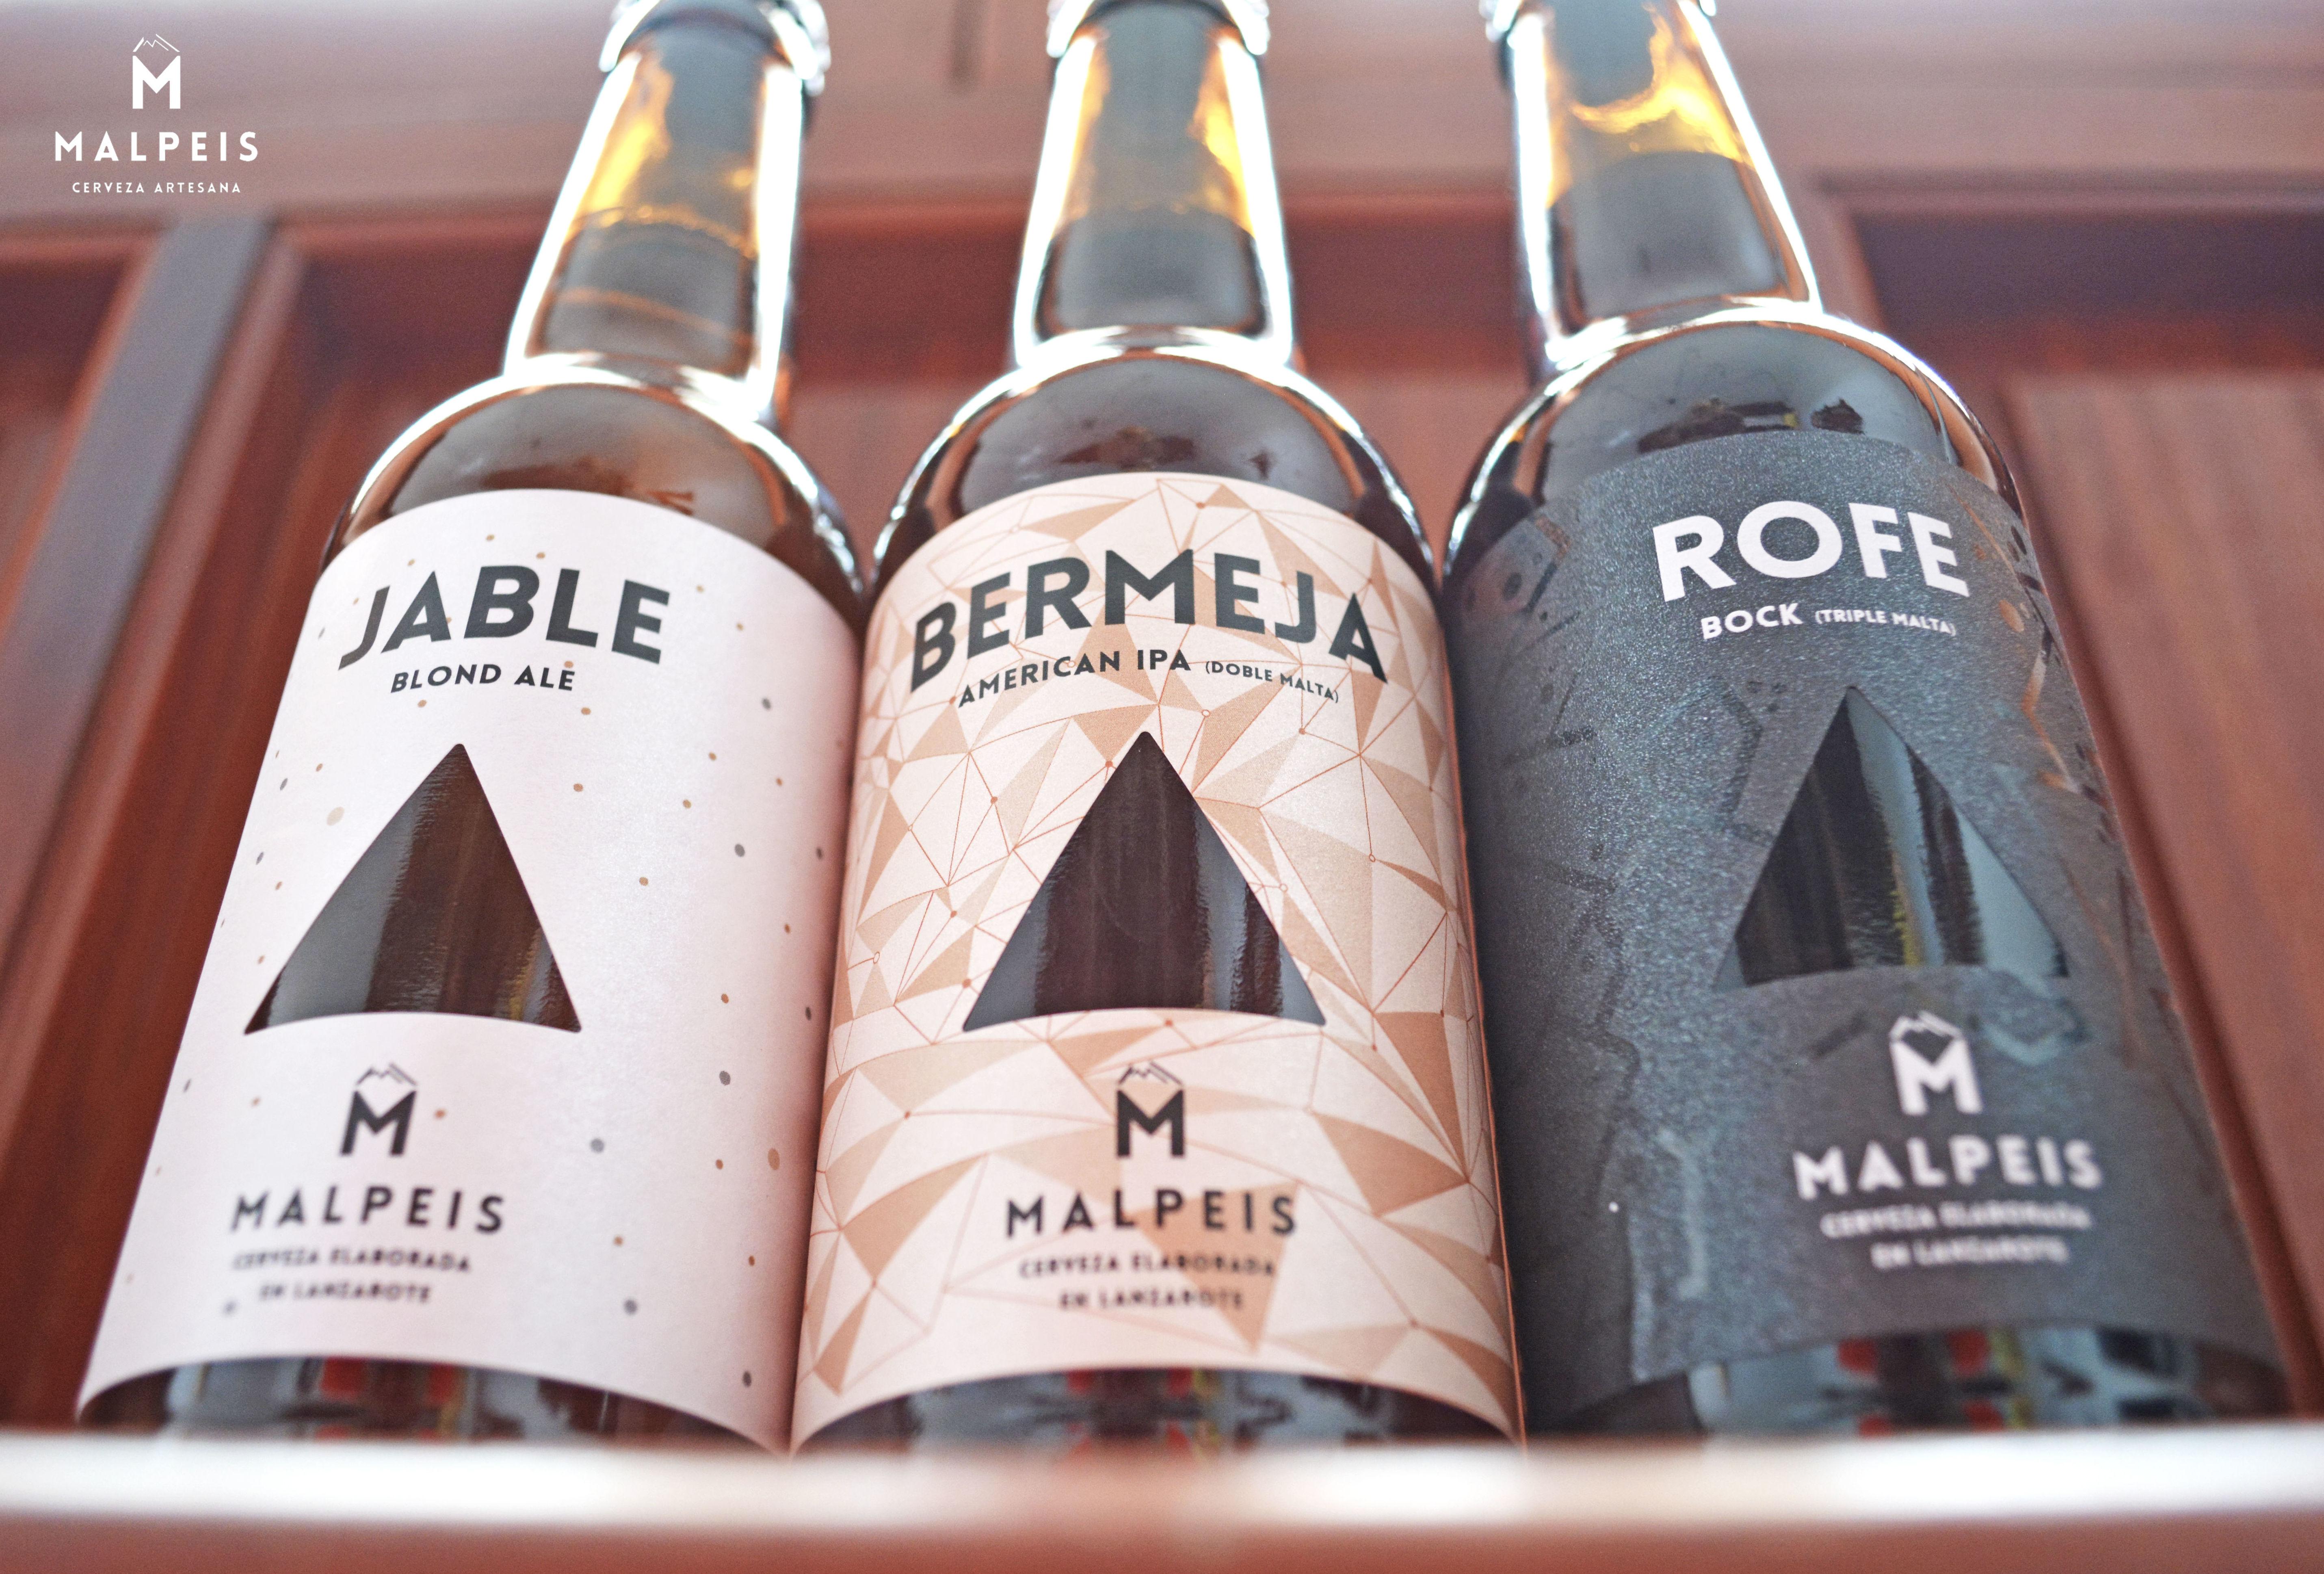 Nuestras variedades de cervezas artesanas Malpeis